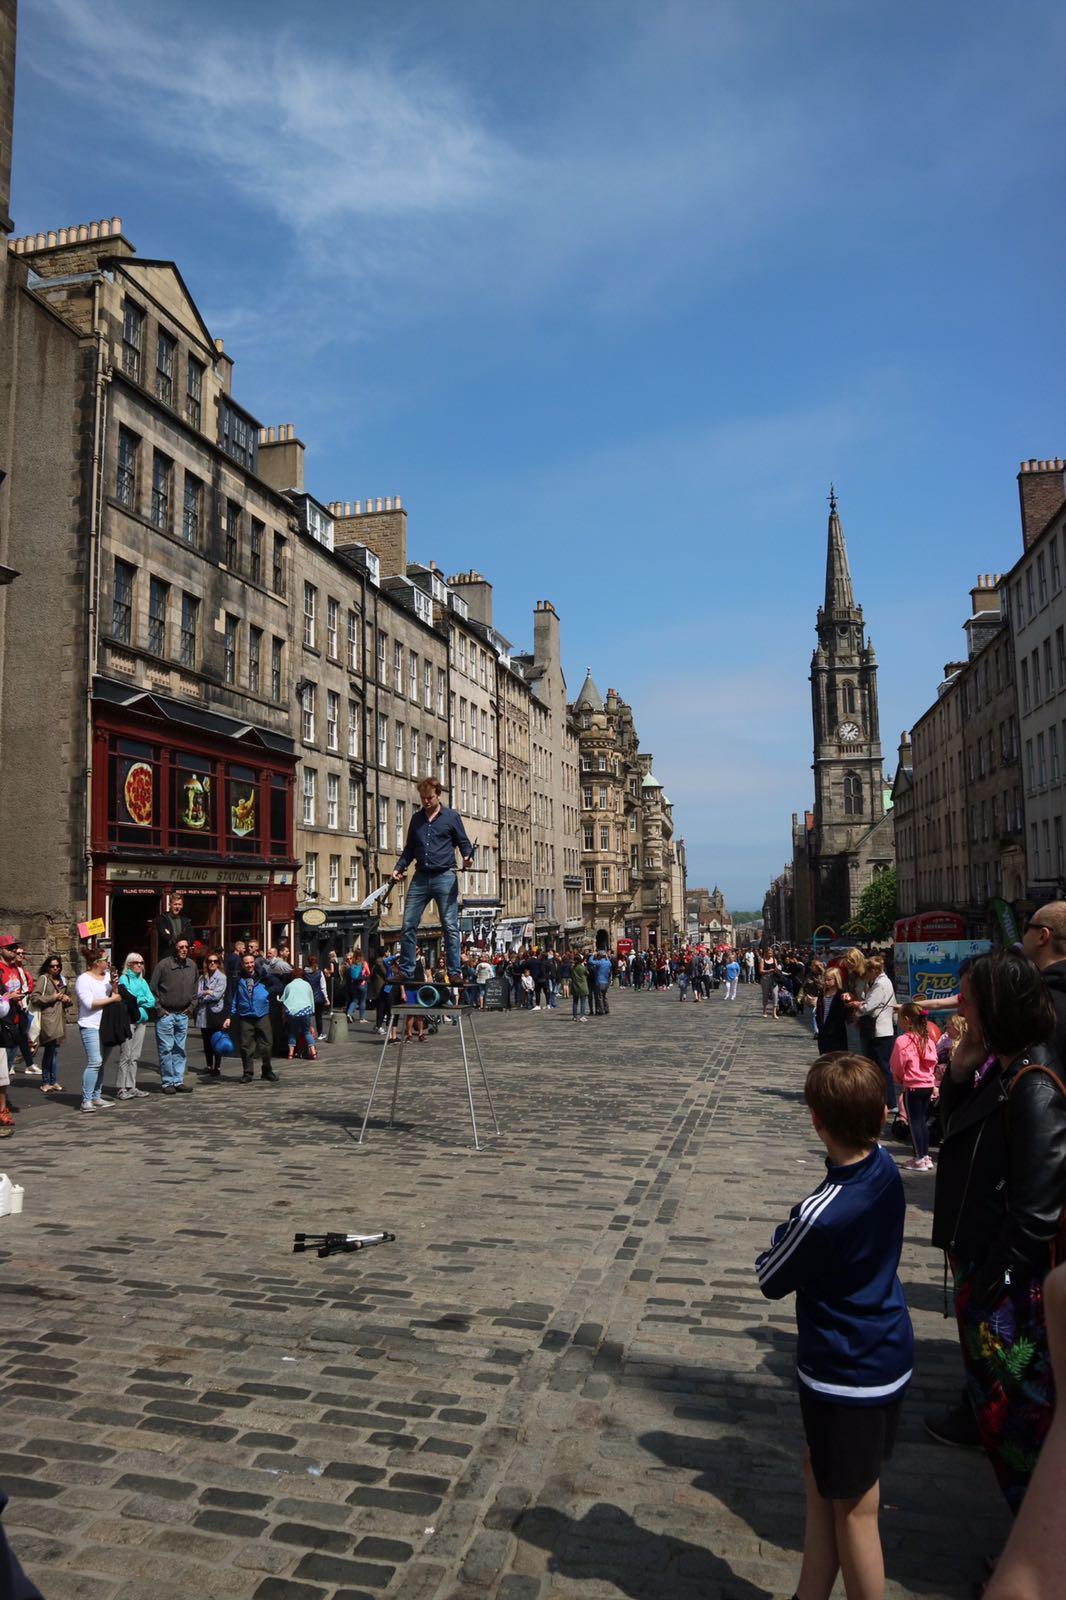 Street performer on stilts on Edinburgh Royal Mile